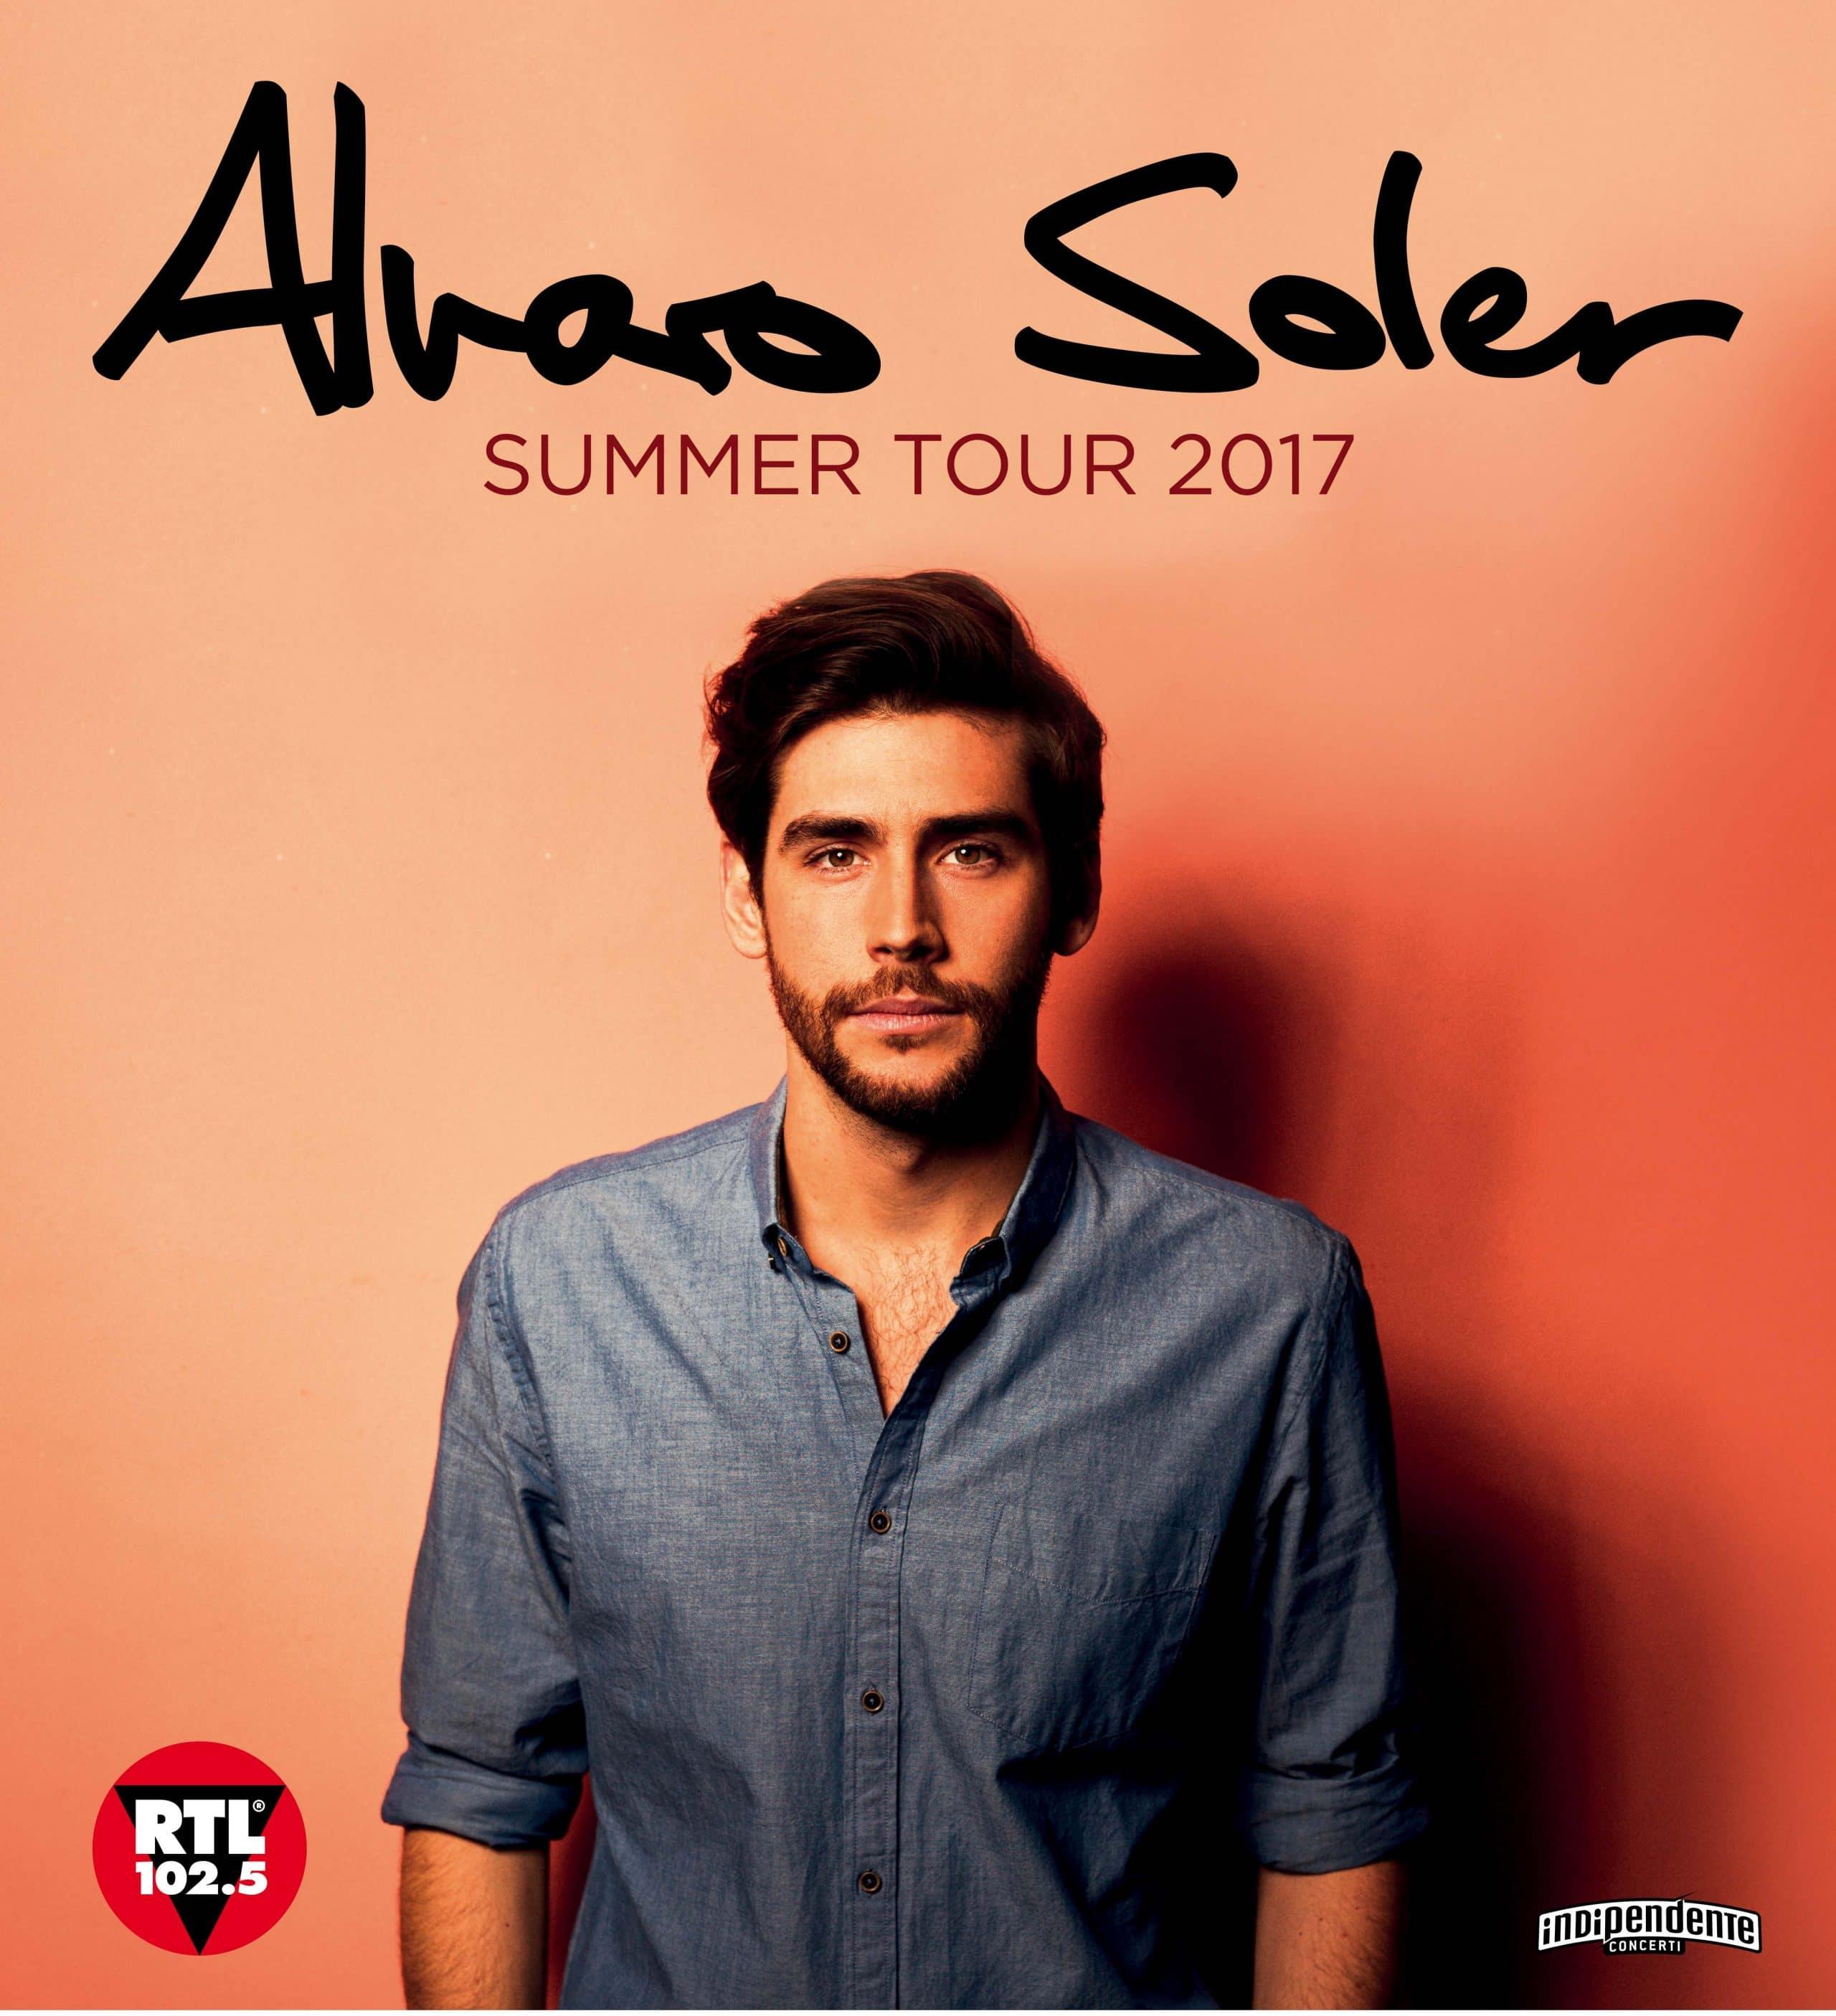 soler summer tour artwork